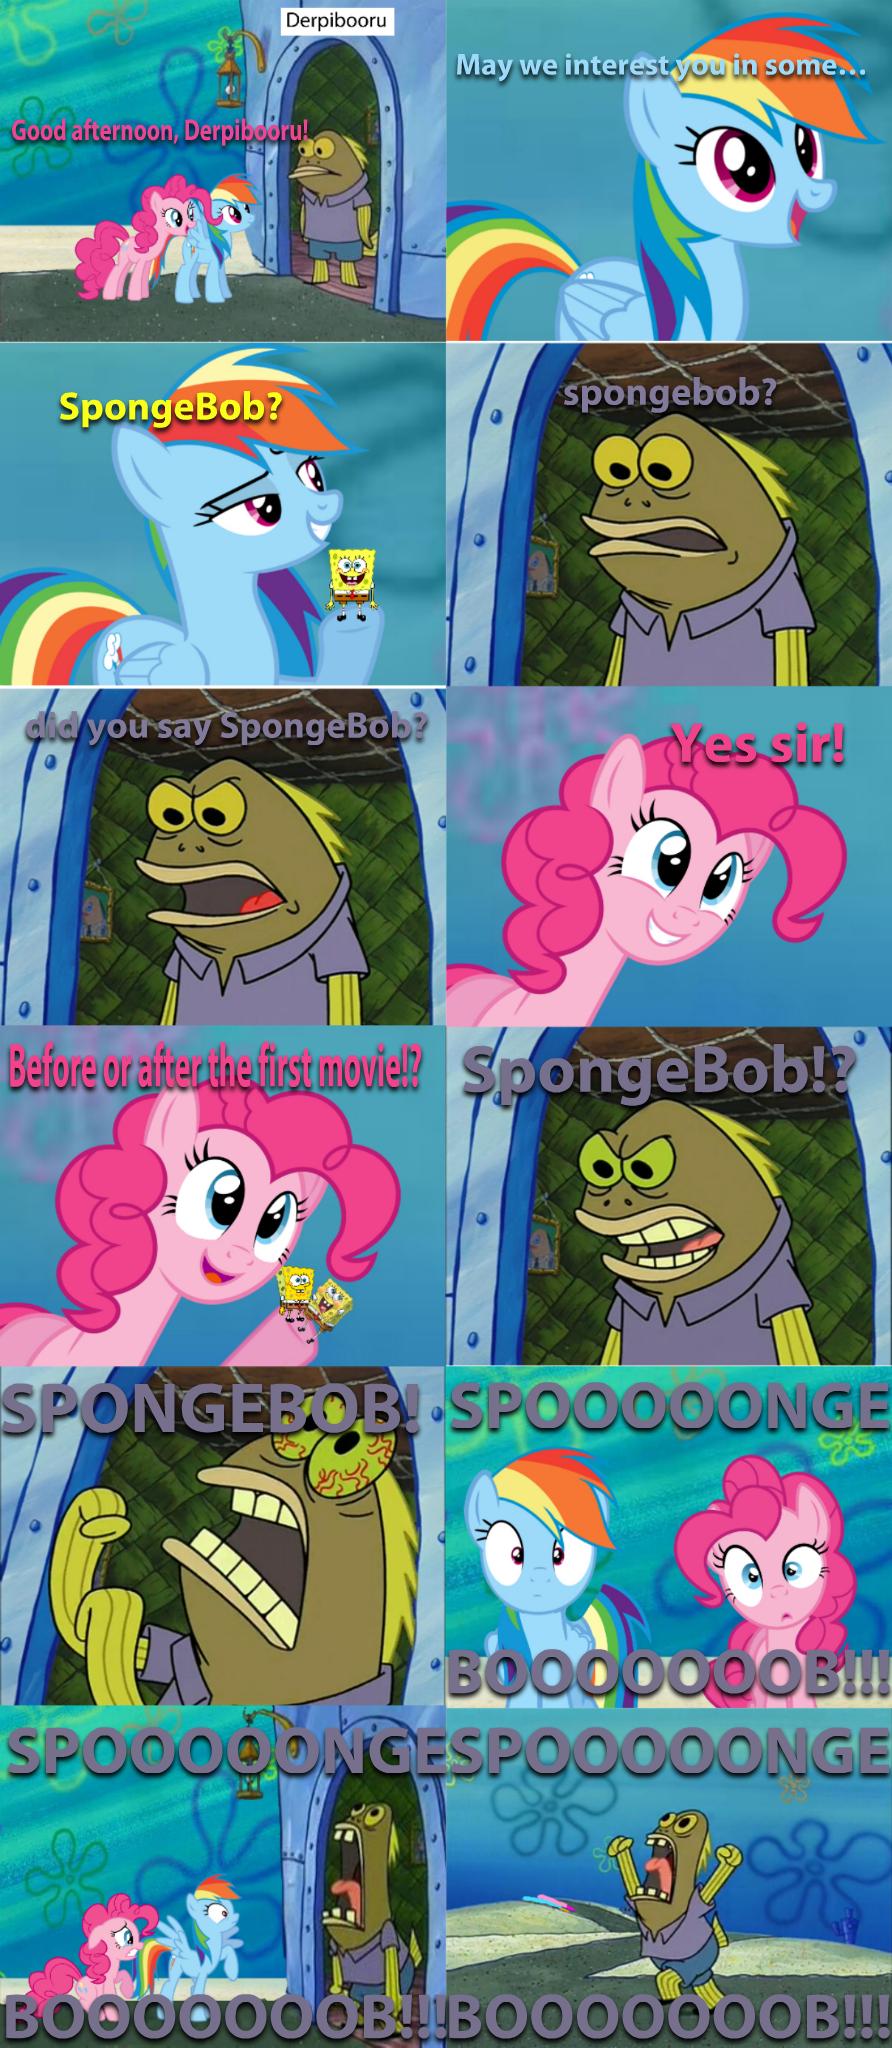 Derpibooru may we interéstvouin some good afternoon der · spongebob spongebob